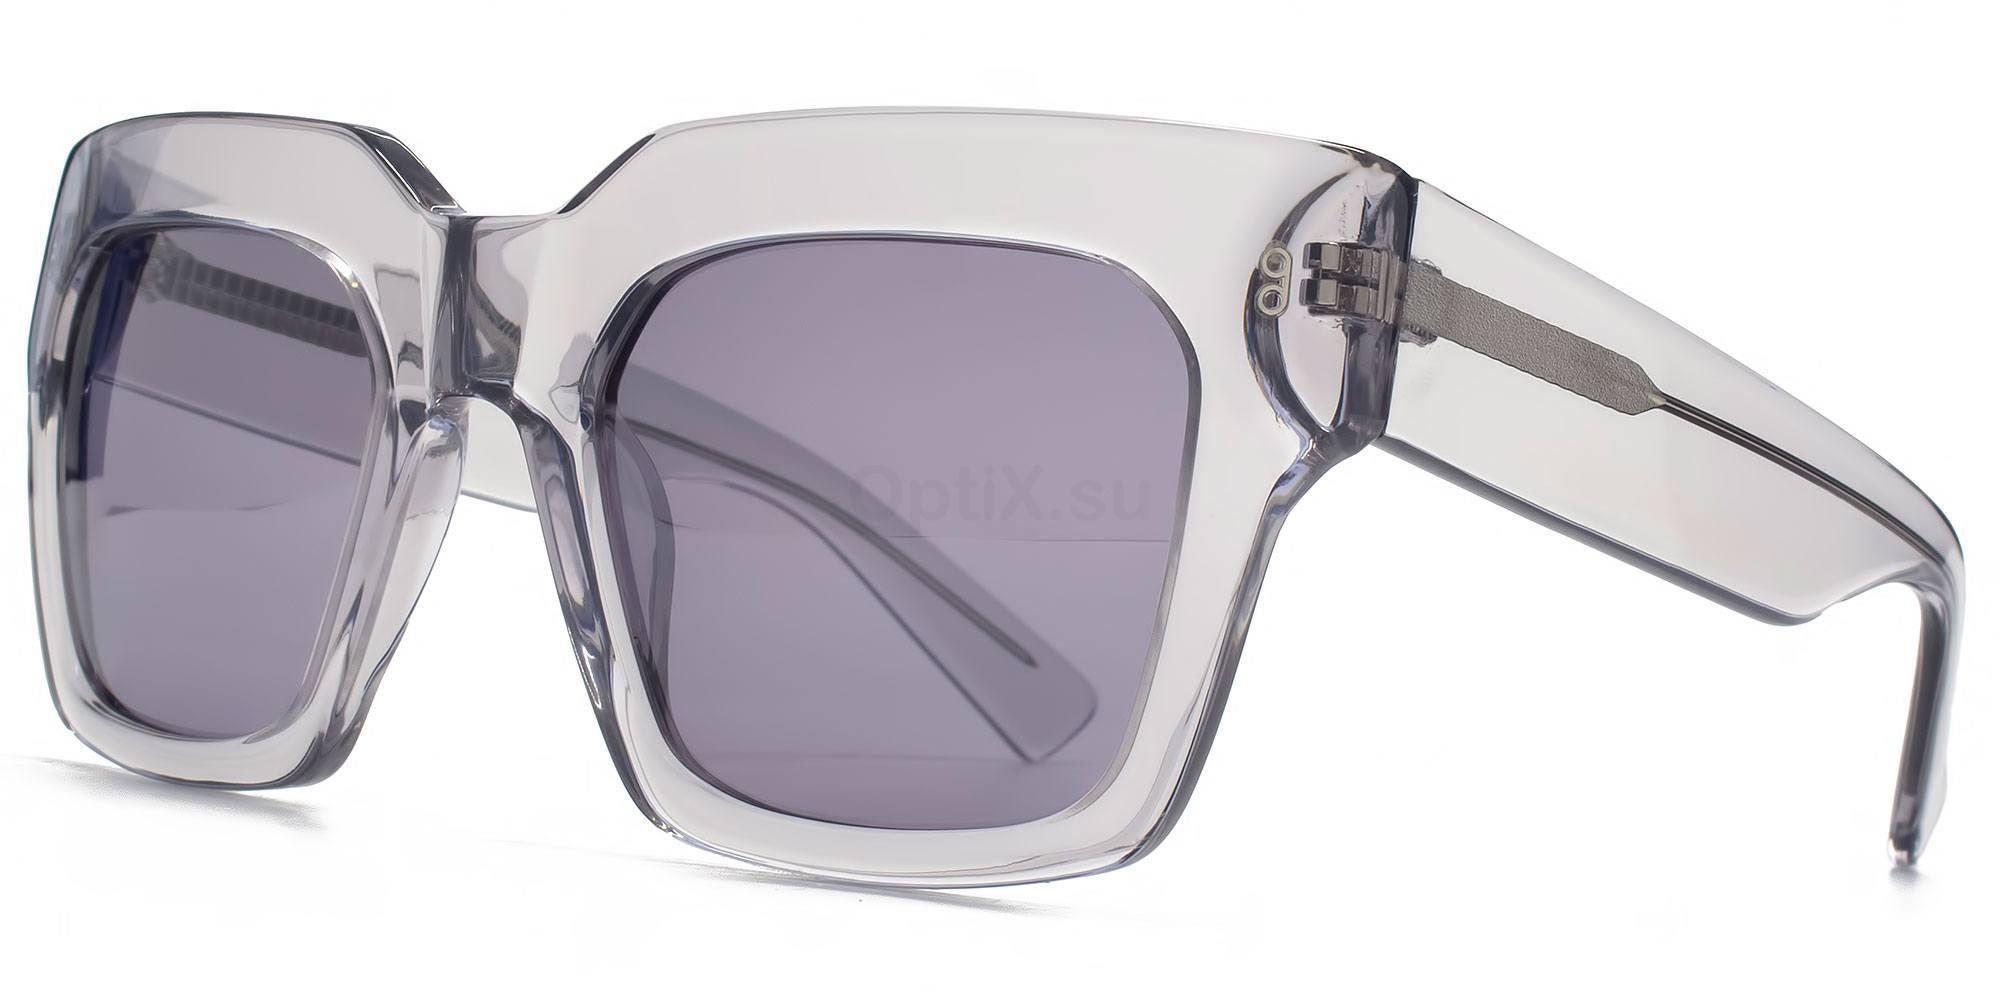 GRY HK009 - GENESIS Sunglasses, Hook LDN